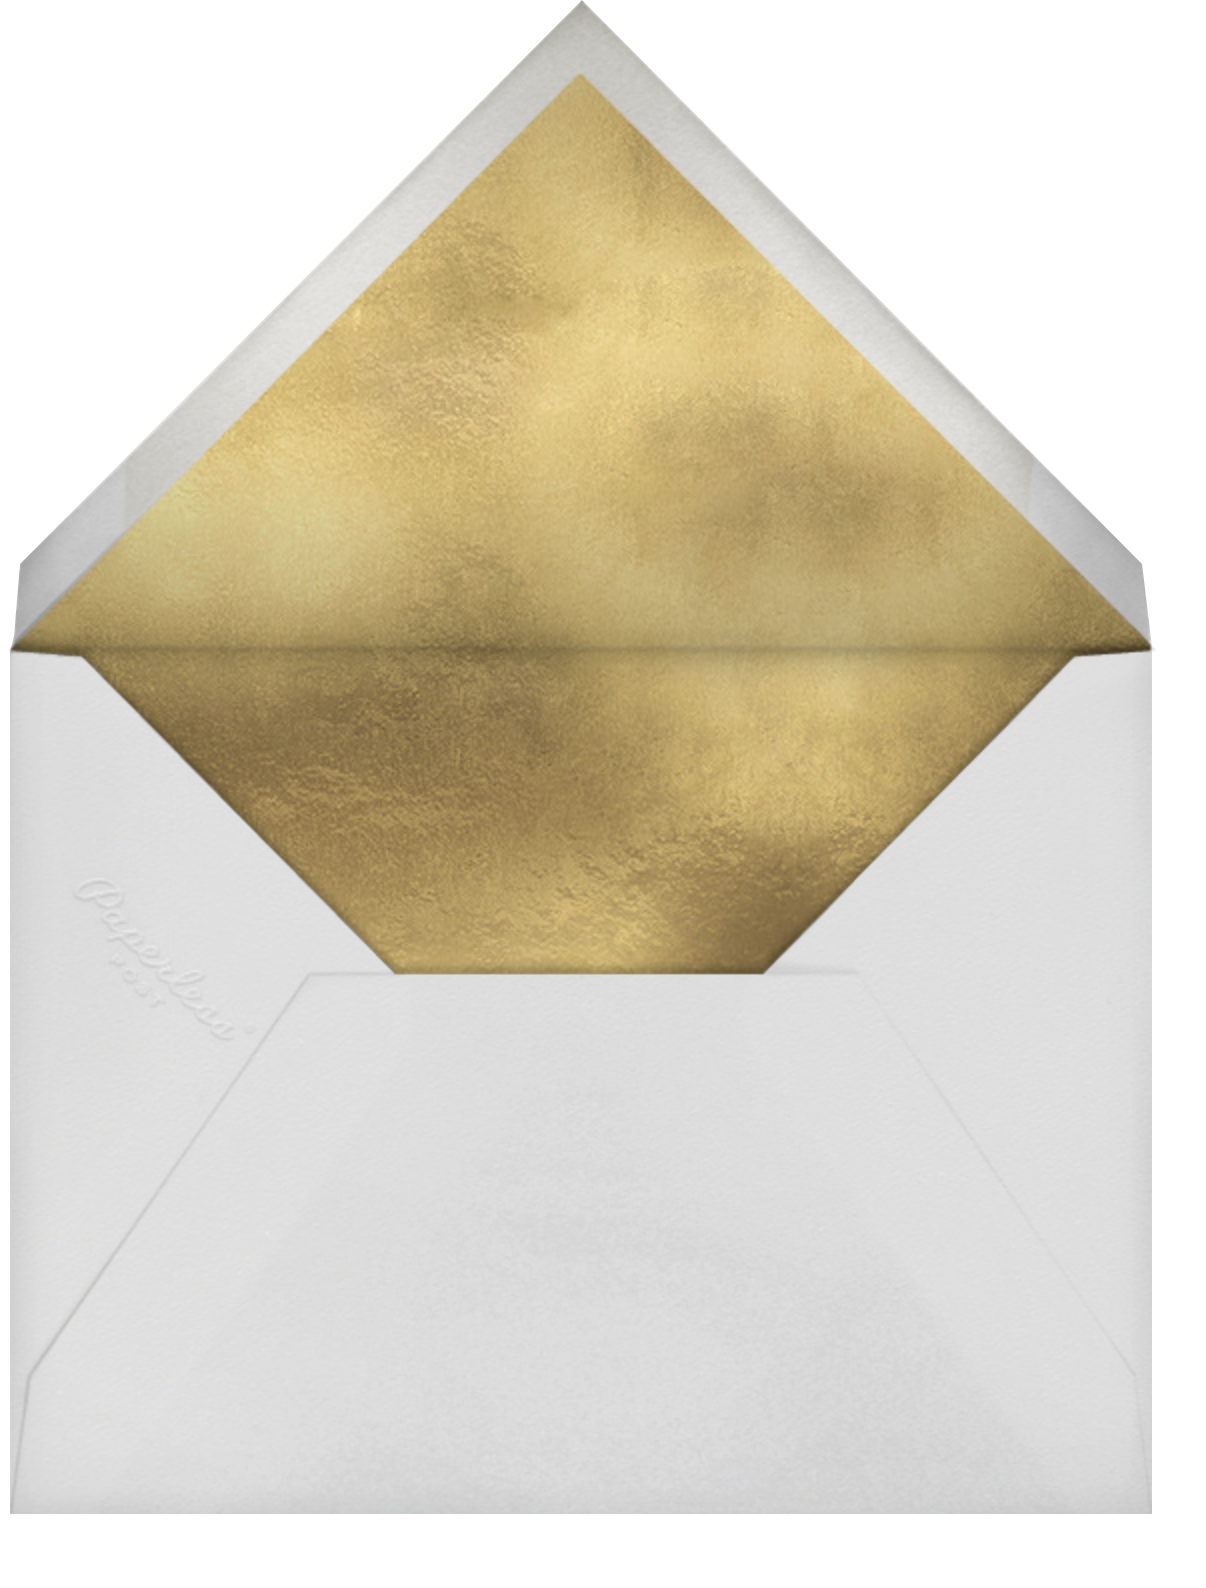 Vellum View - Paperless Post - Wedding brunch - envelope back